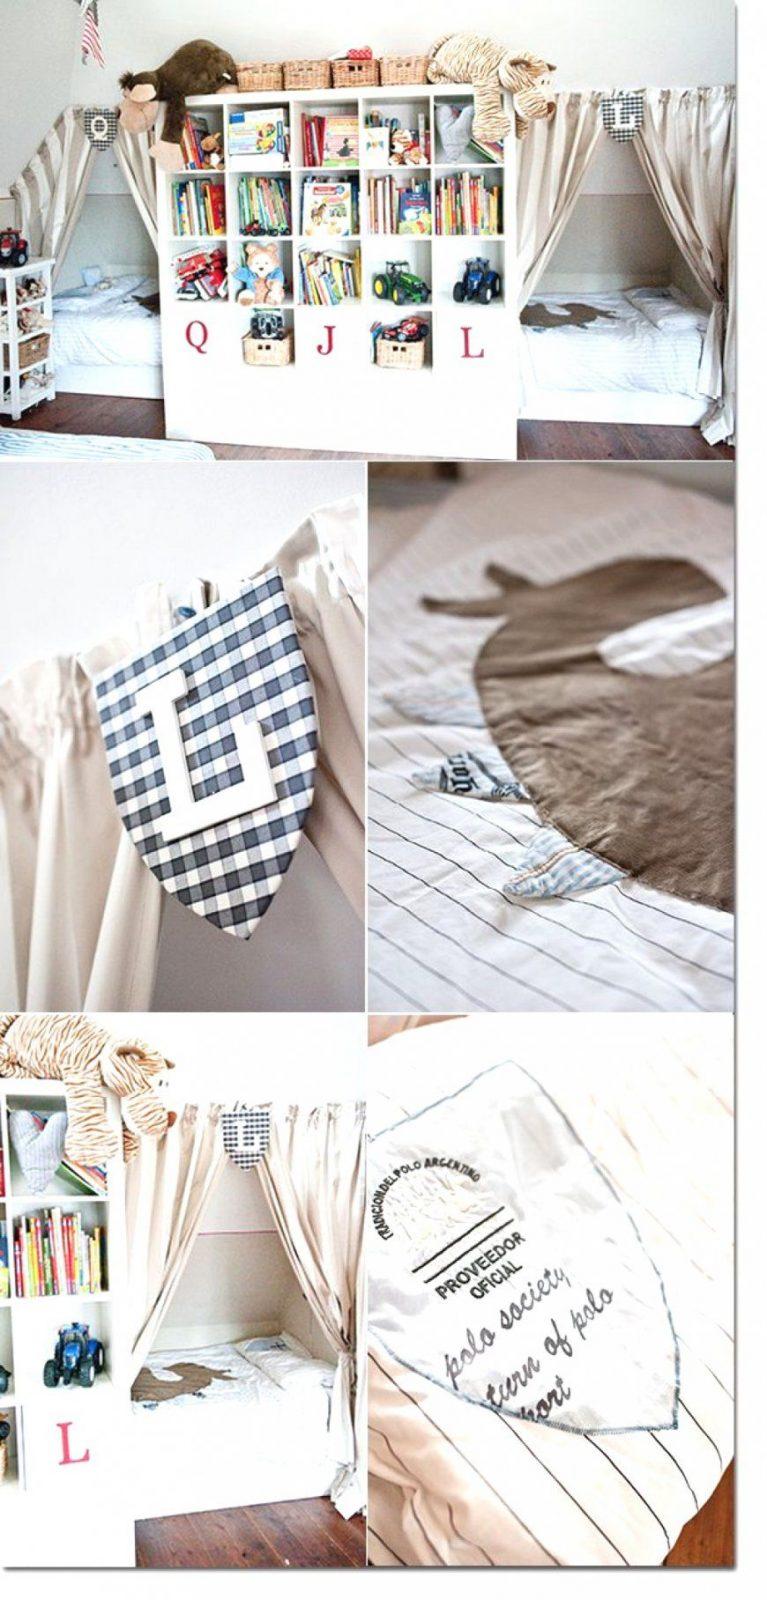 Charmante Inspiration Bettwäsche Selber Designen Und Beeindruckende von Bettwäsche Selber Designen Photo